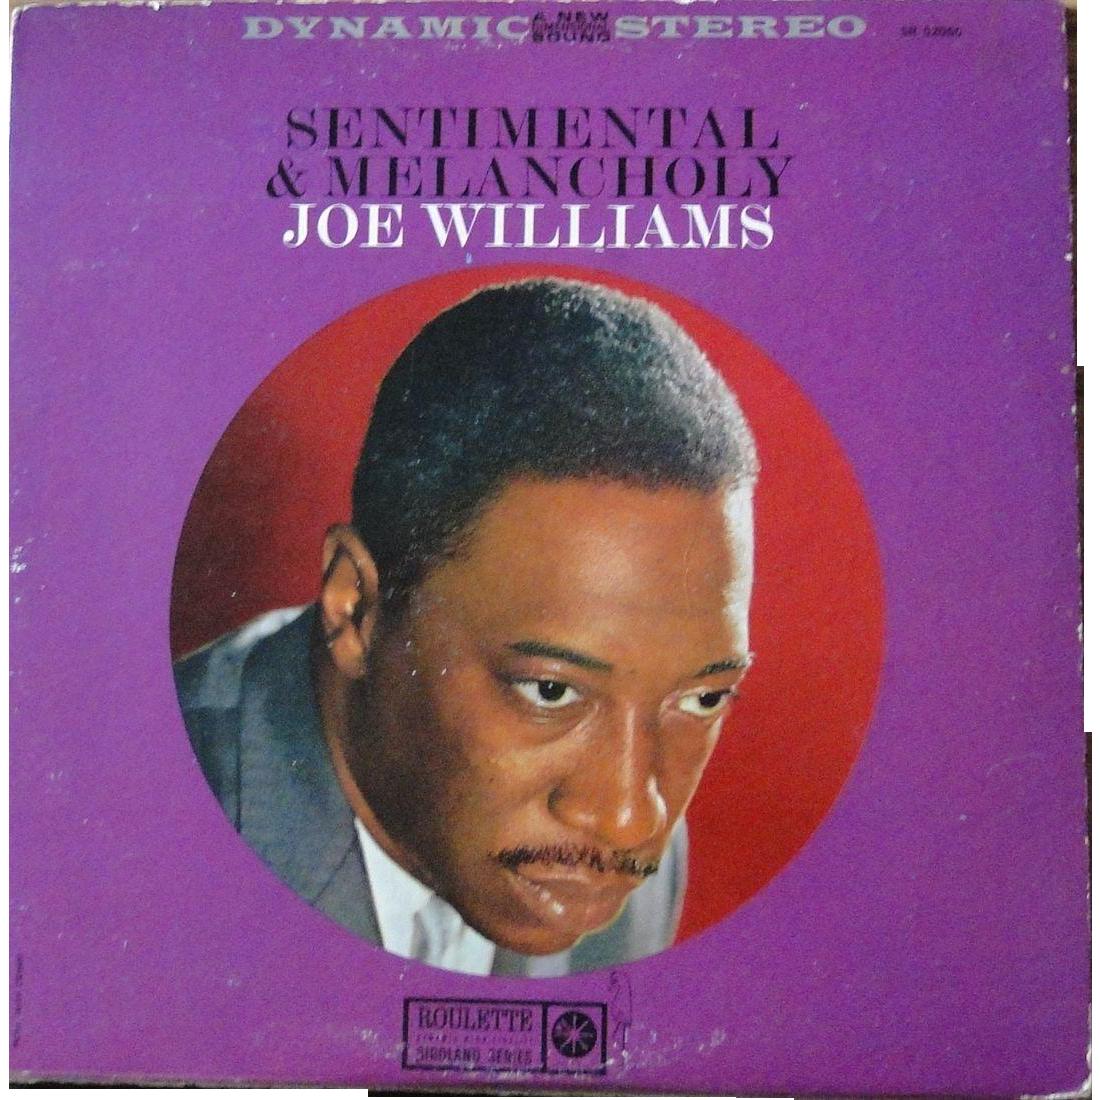 Vintage Phonograph Album By Joe Williams Jazz Singer On